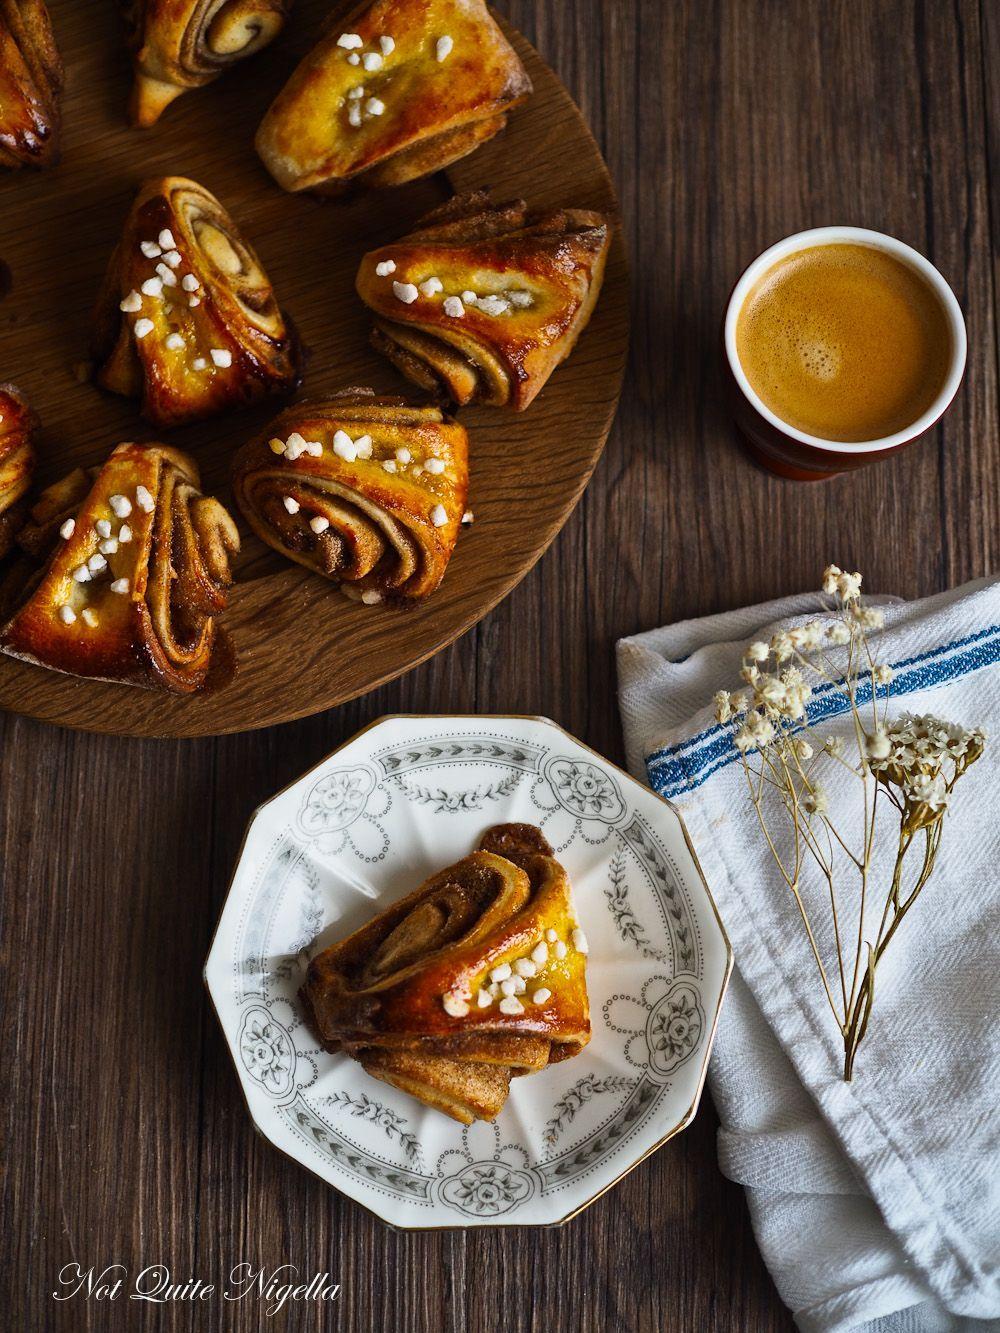 Korvapuusti: Finnish Cinnamon Cardamom Buns #cardamombuns Korvapuusti Finnish Cinnamon Cardamom Buns #cardamombuns